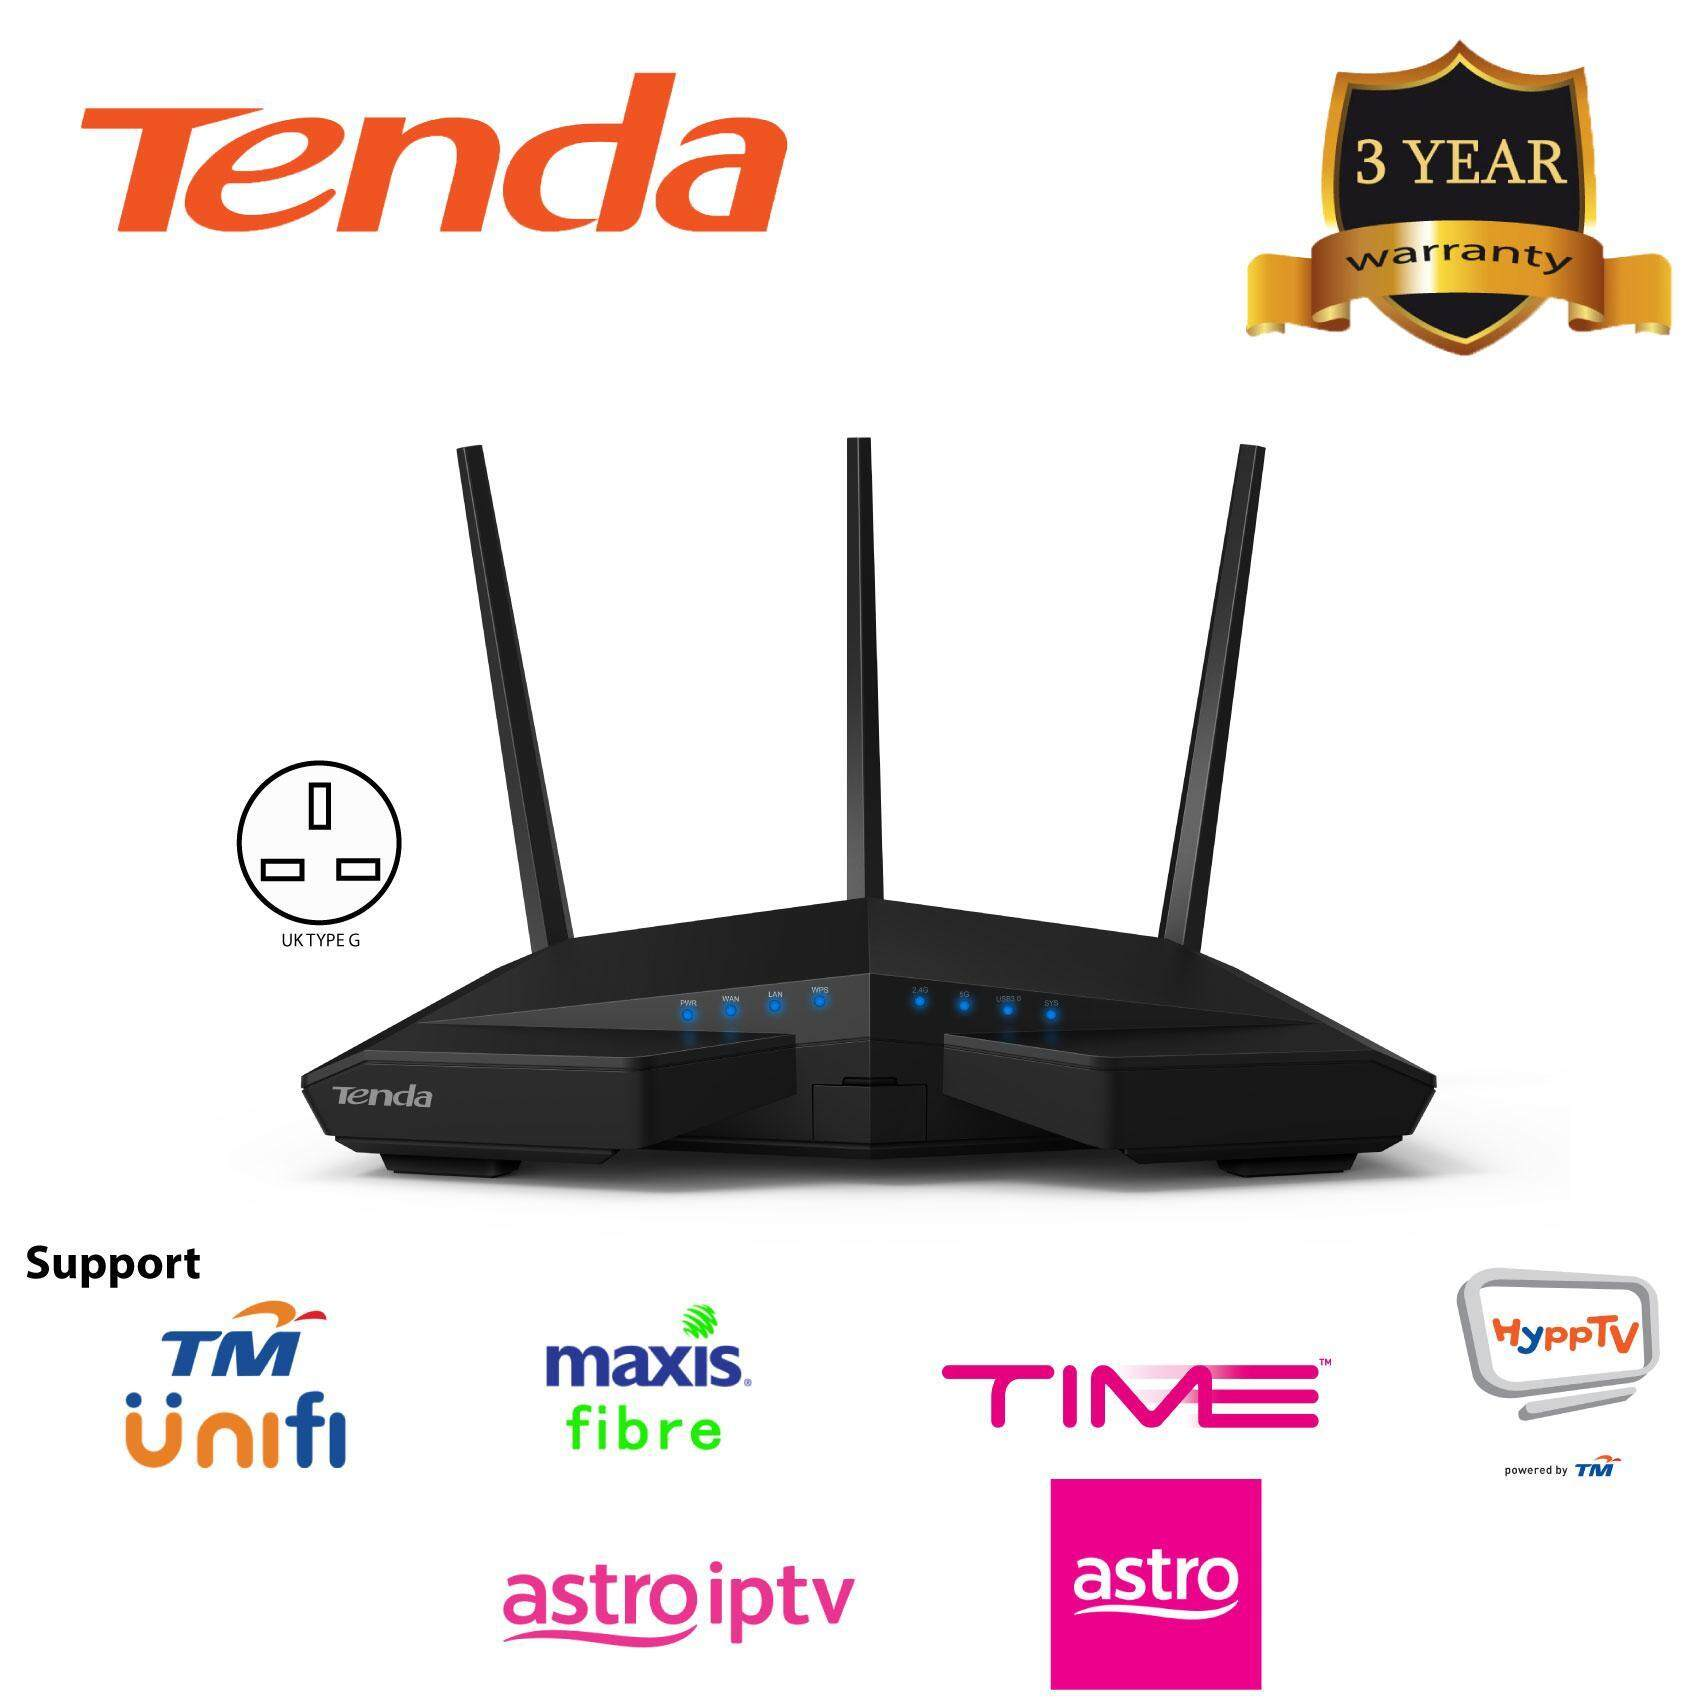 Fitur Tenda Dome Camping Great Outdoor Monodome 2 Biru Dan Ac18 Ac1900mbps Wireless Router